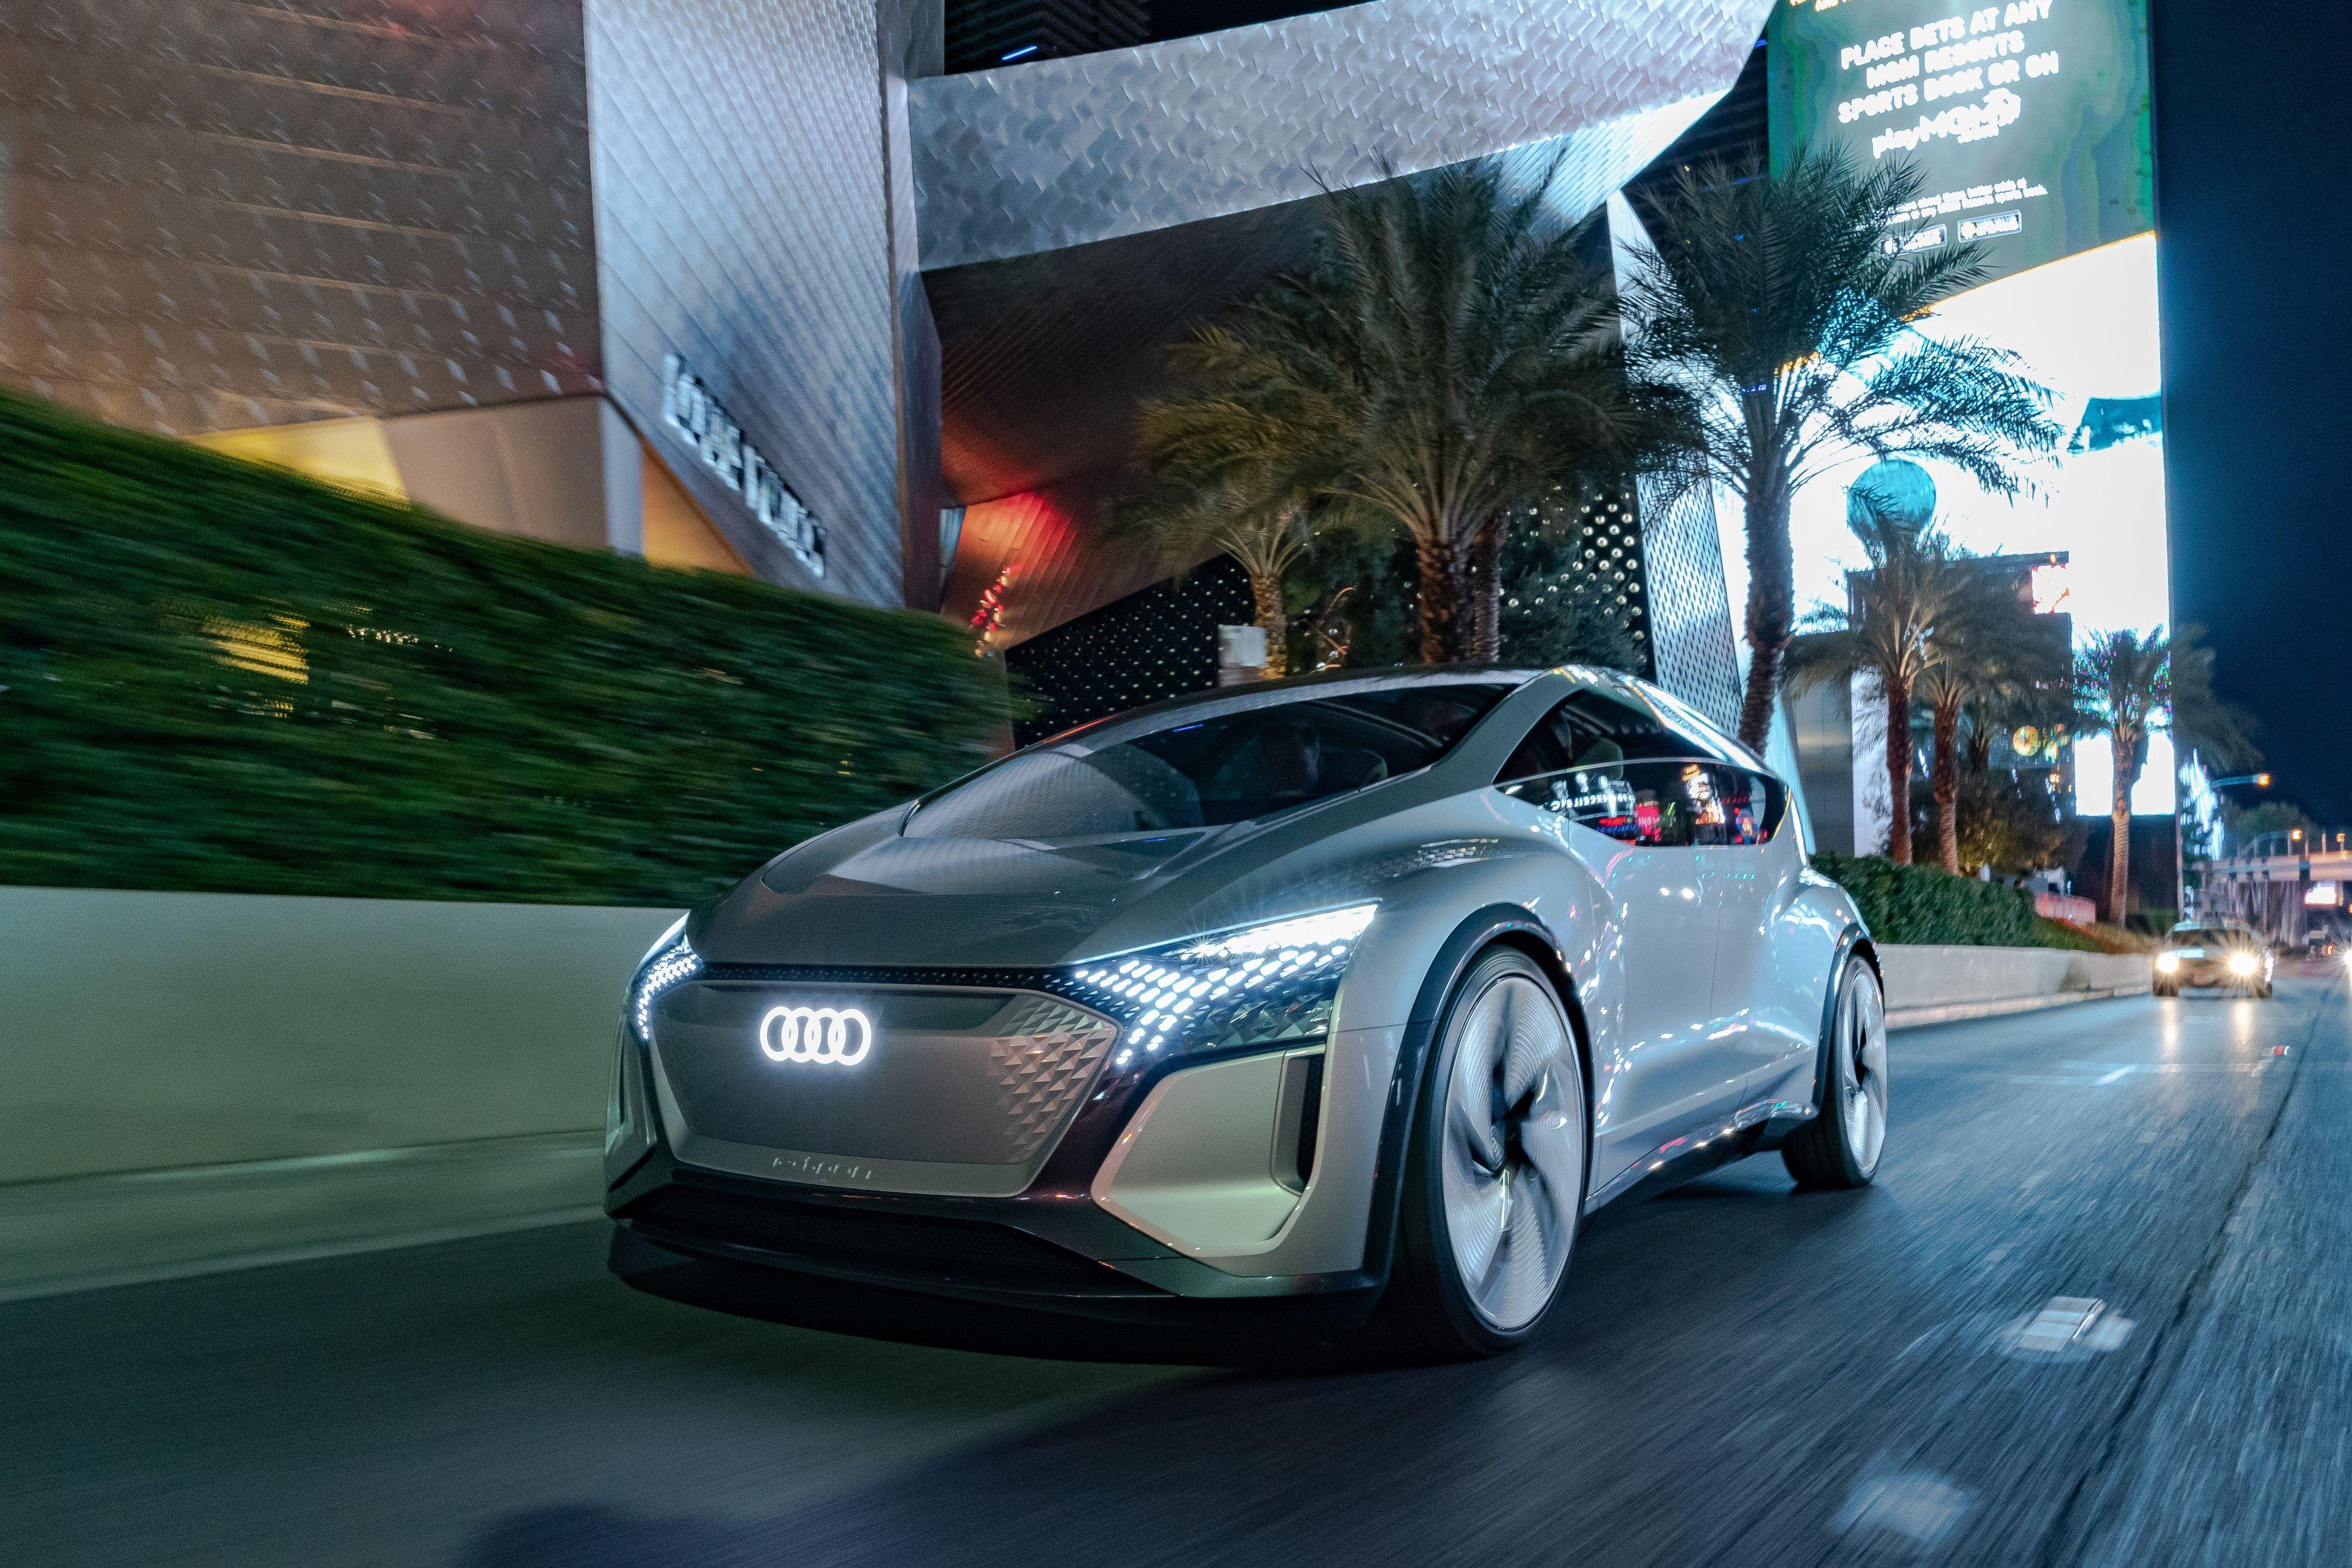 Audi Ai Me Shows Off The Future Of Mobility At Ces 2020 Audi Concept Cars City Car